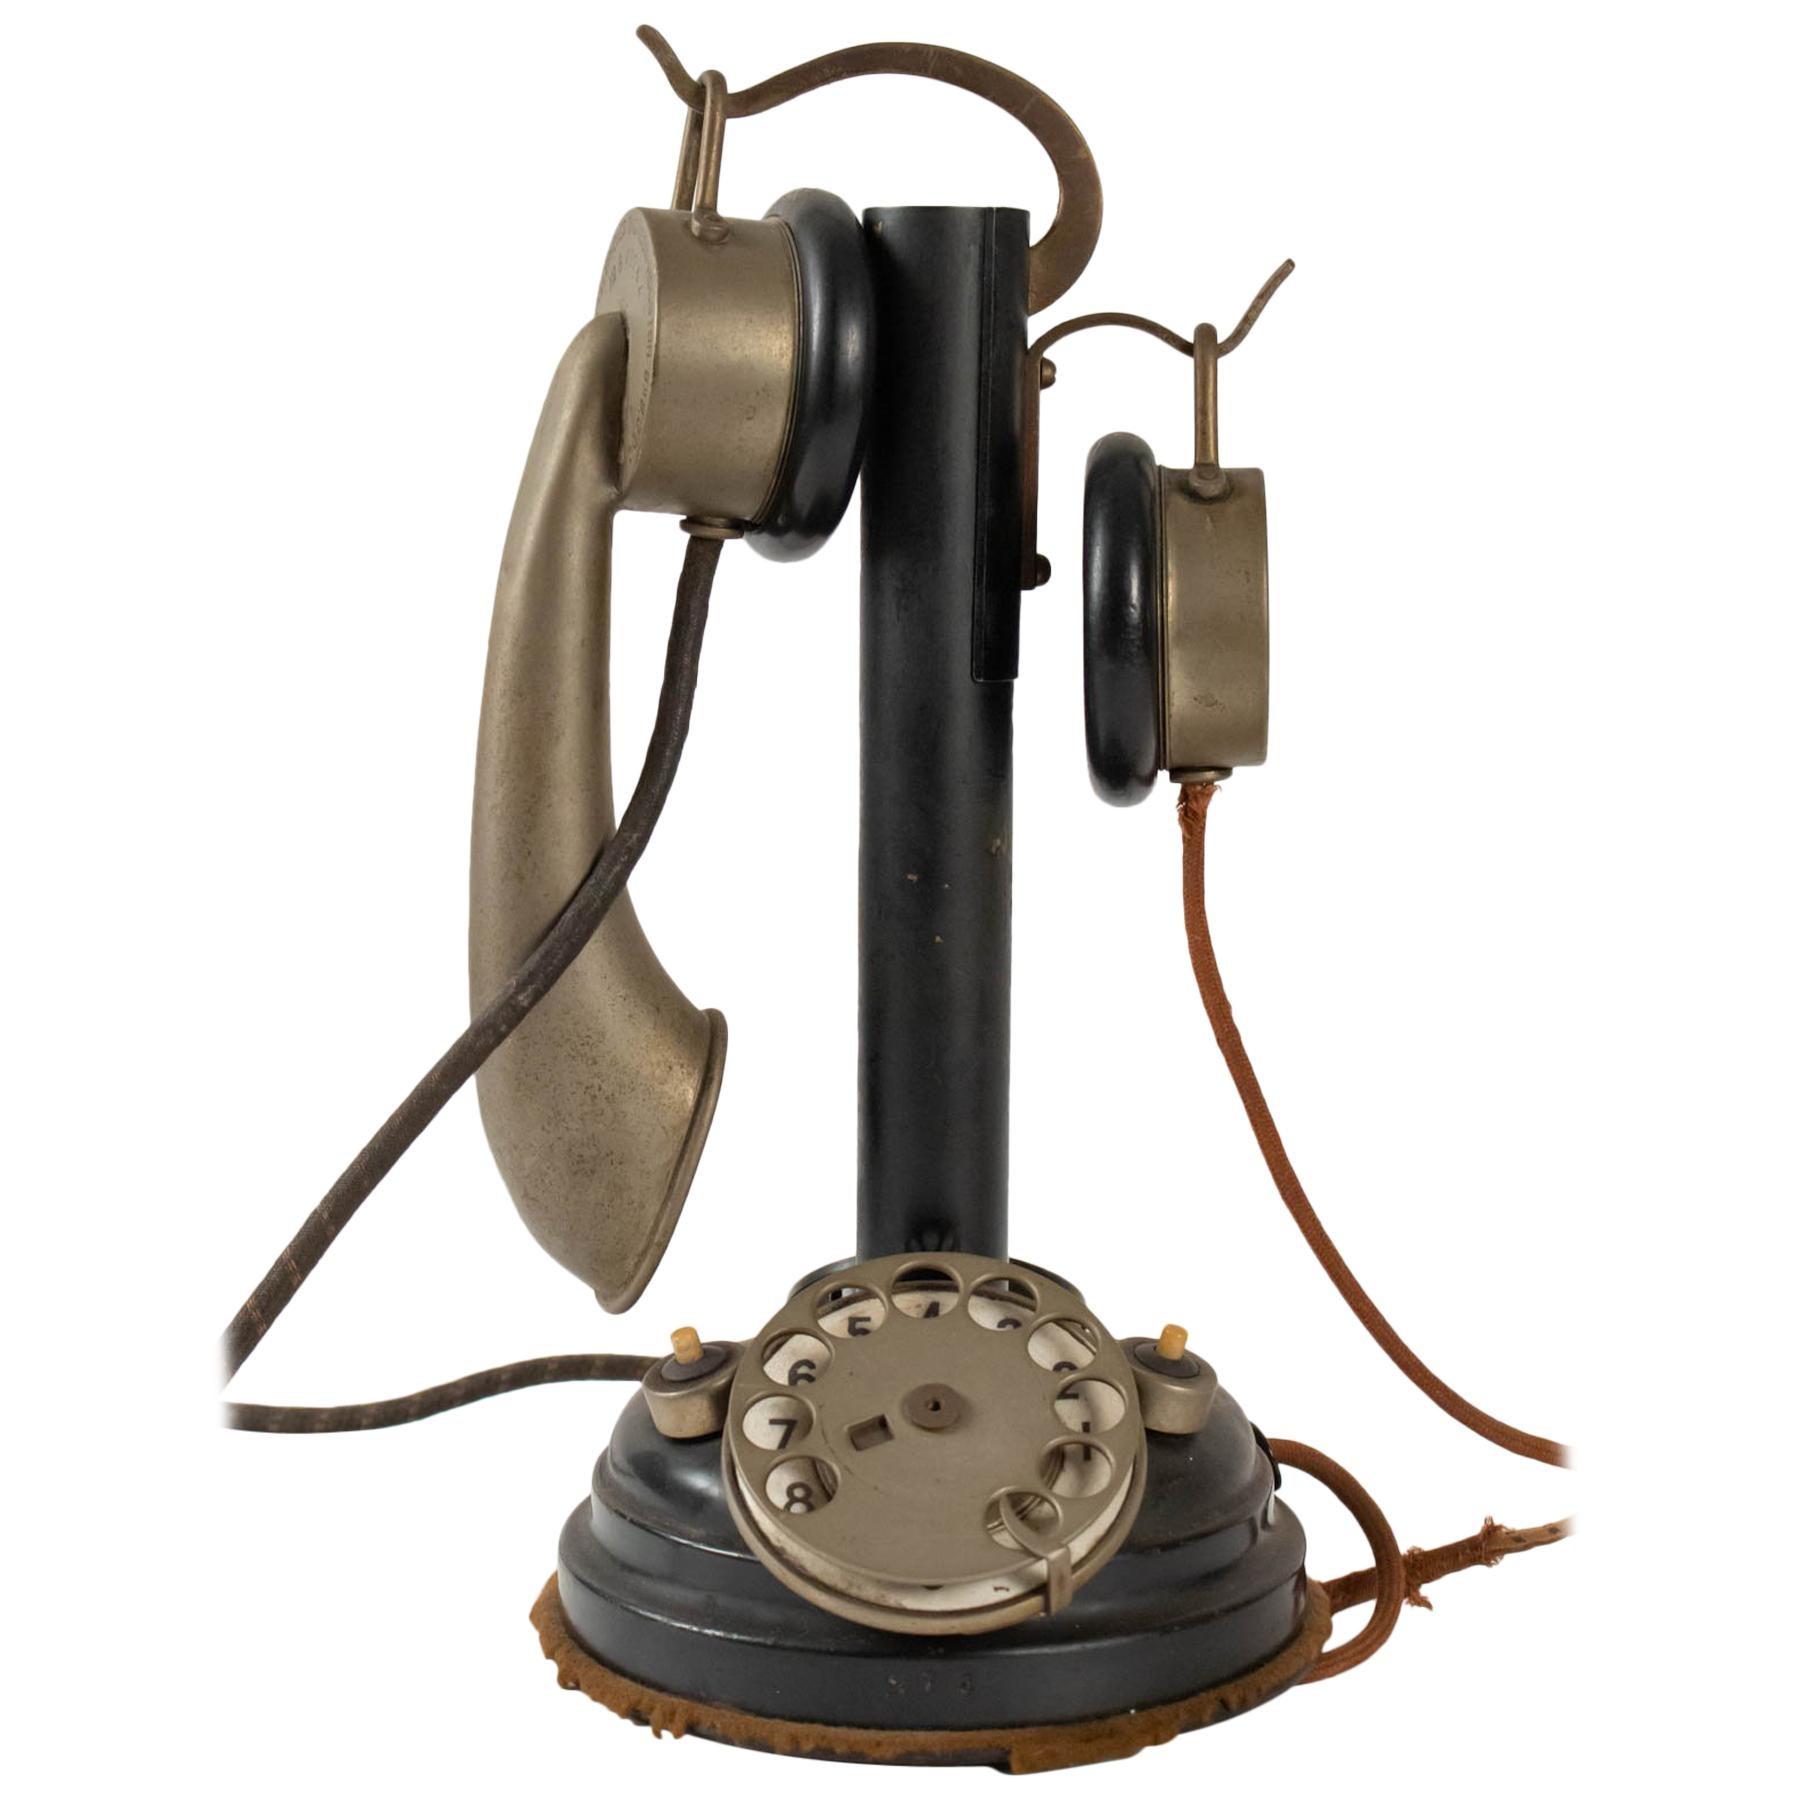 1930-1940 Telephone, Thomson-Houston Telephone Company